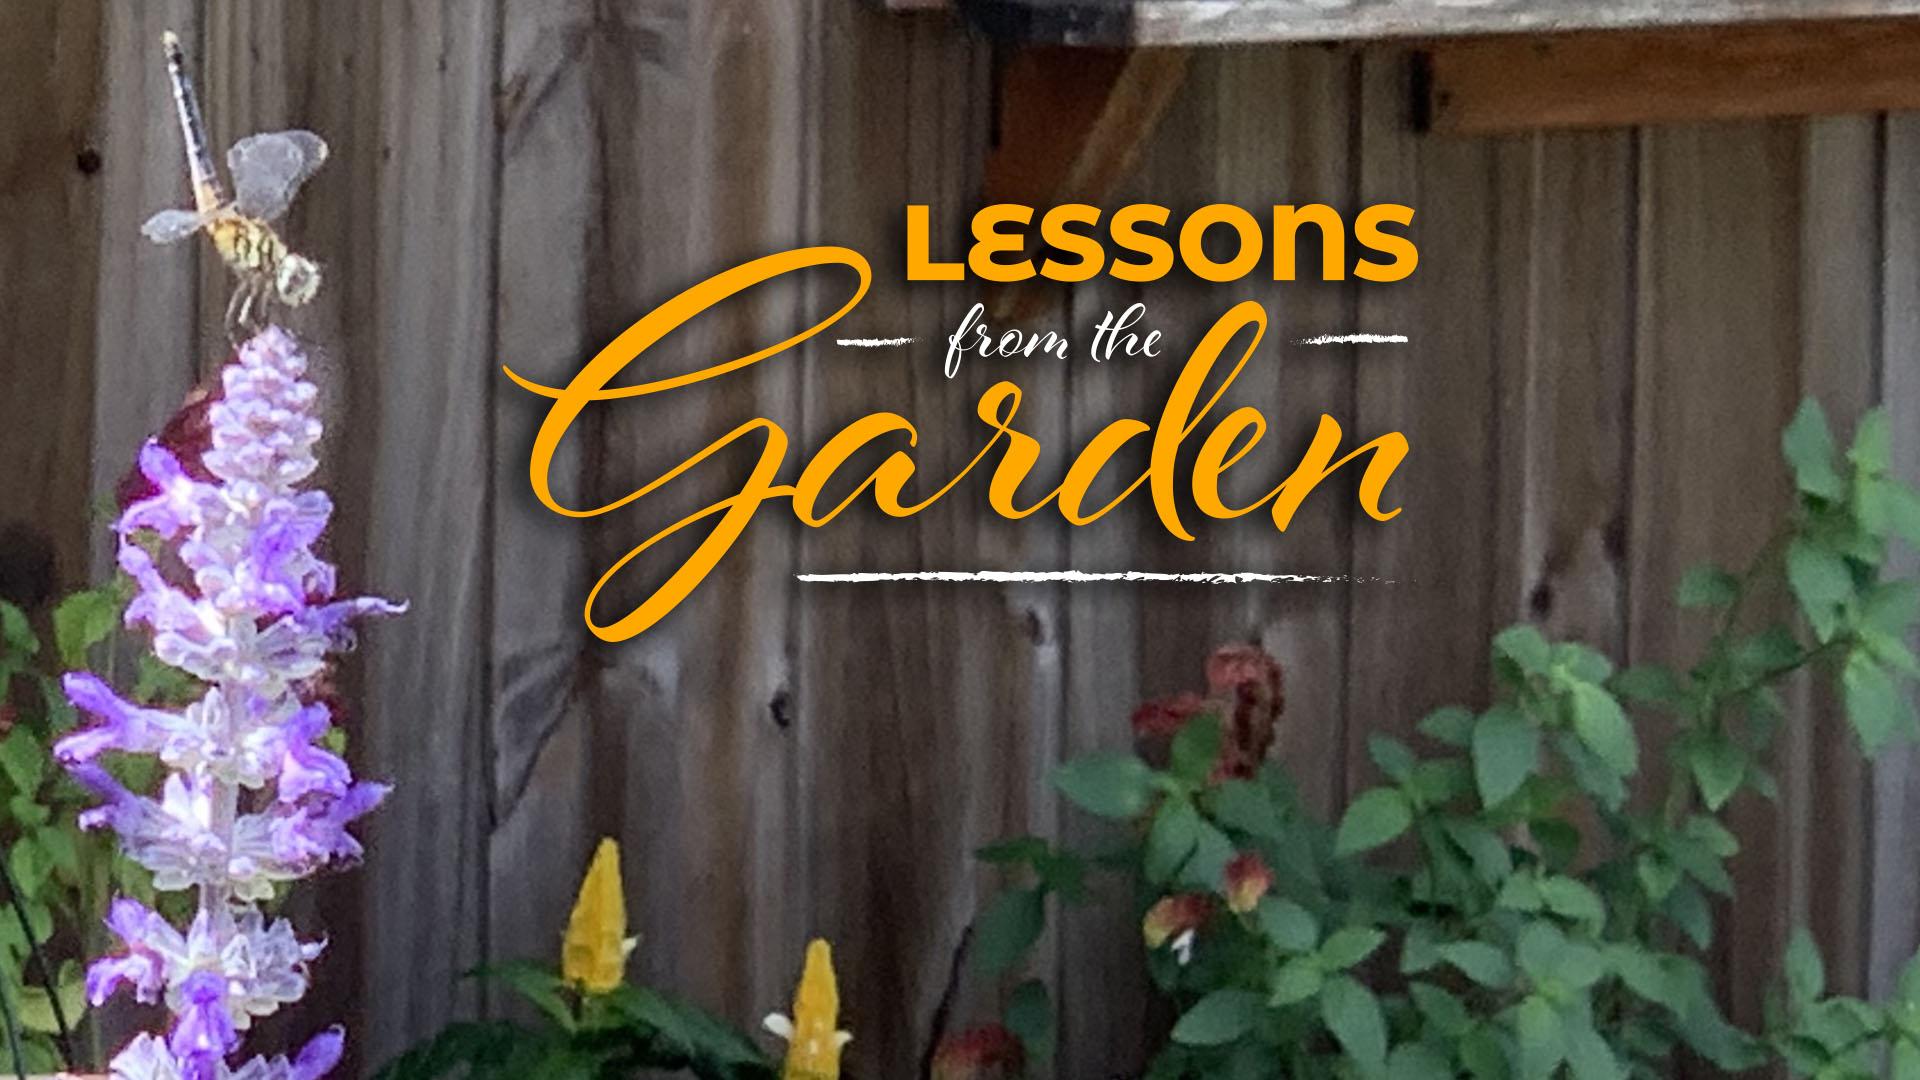 The Song of the Garden